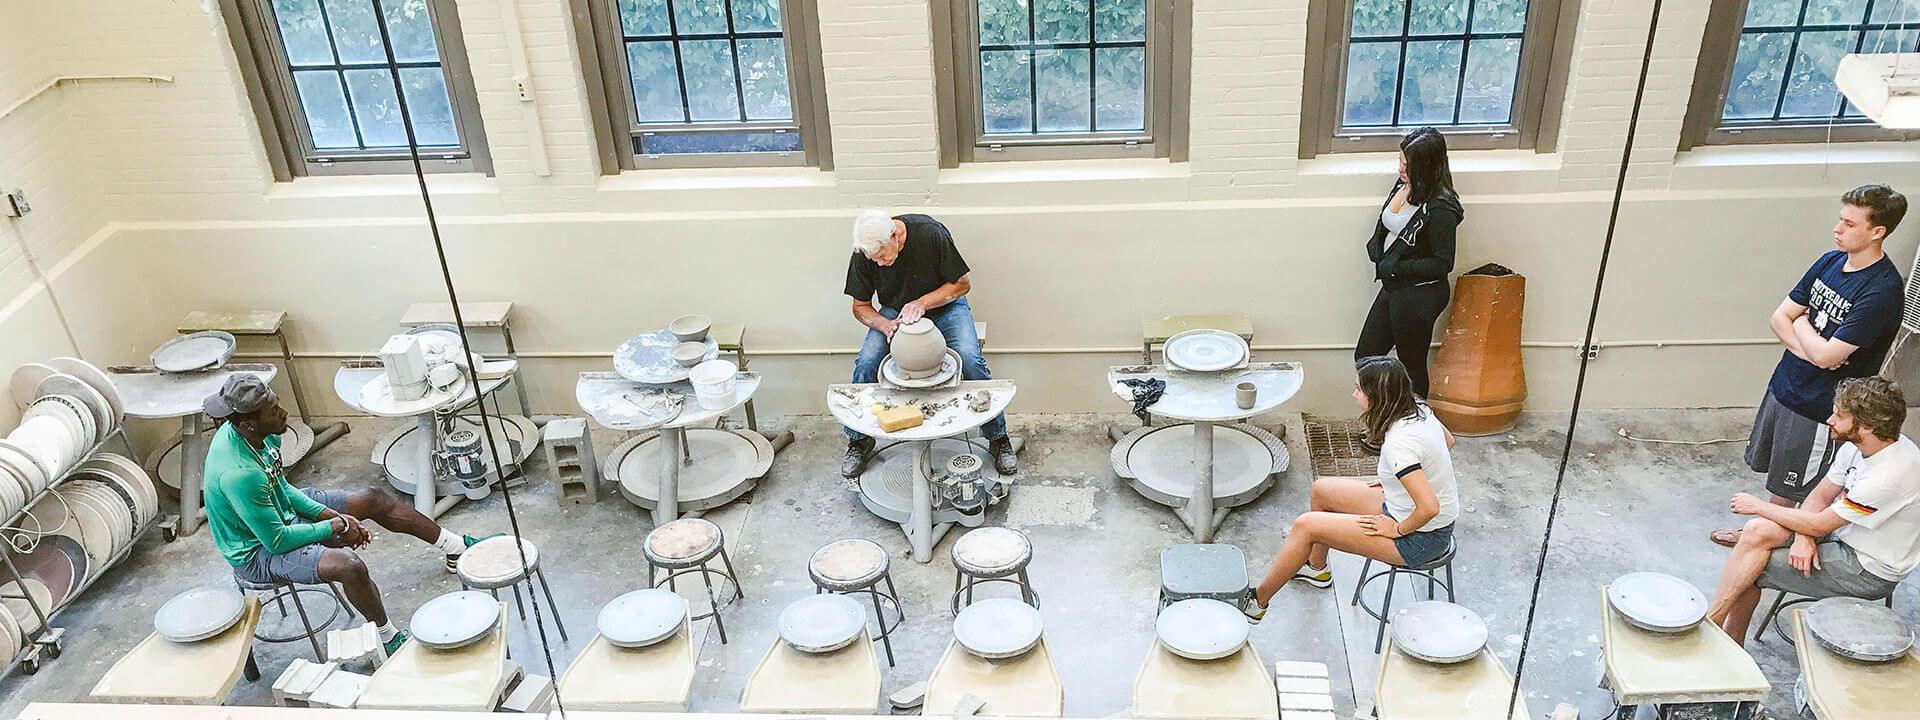 Ceramics Department Of Art Art History Design University Of Notre Dame